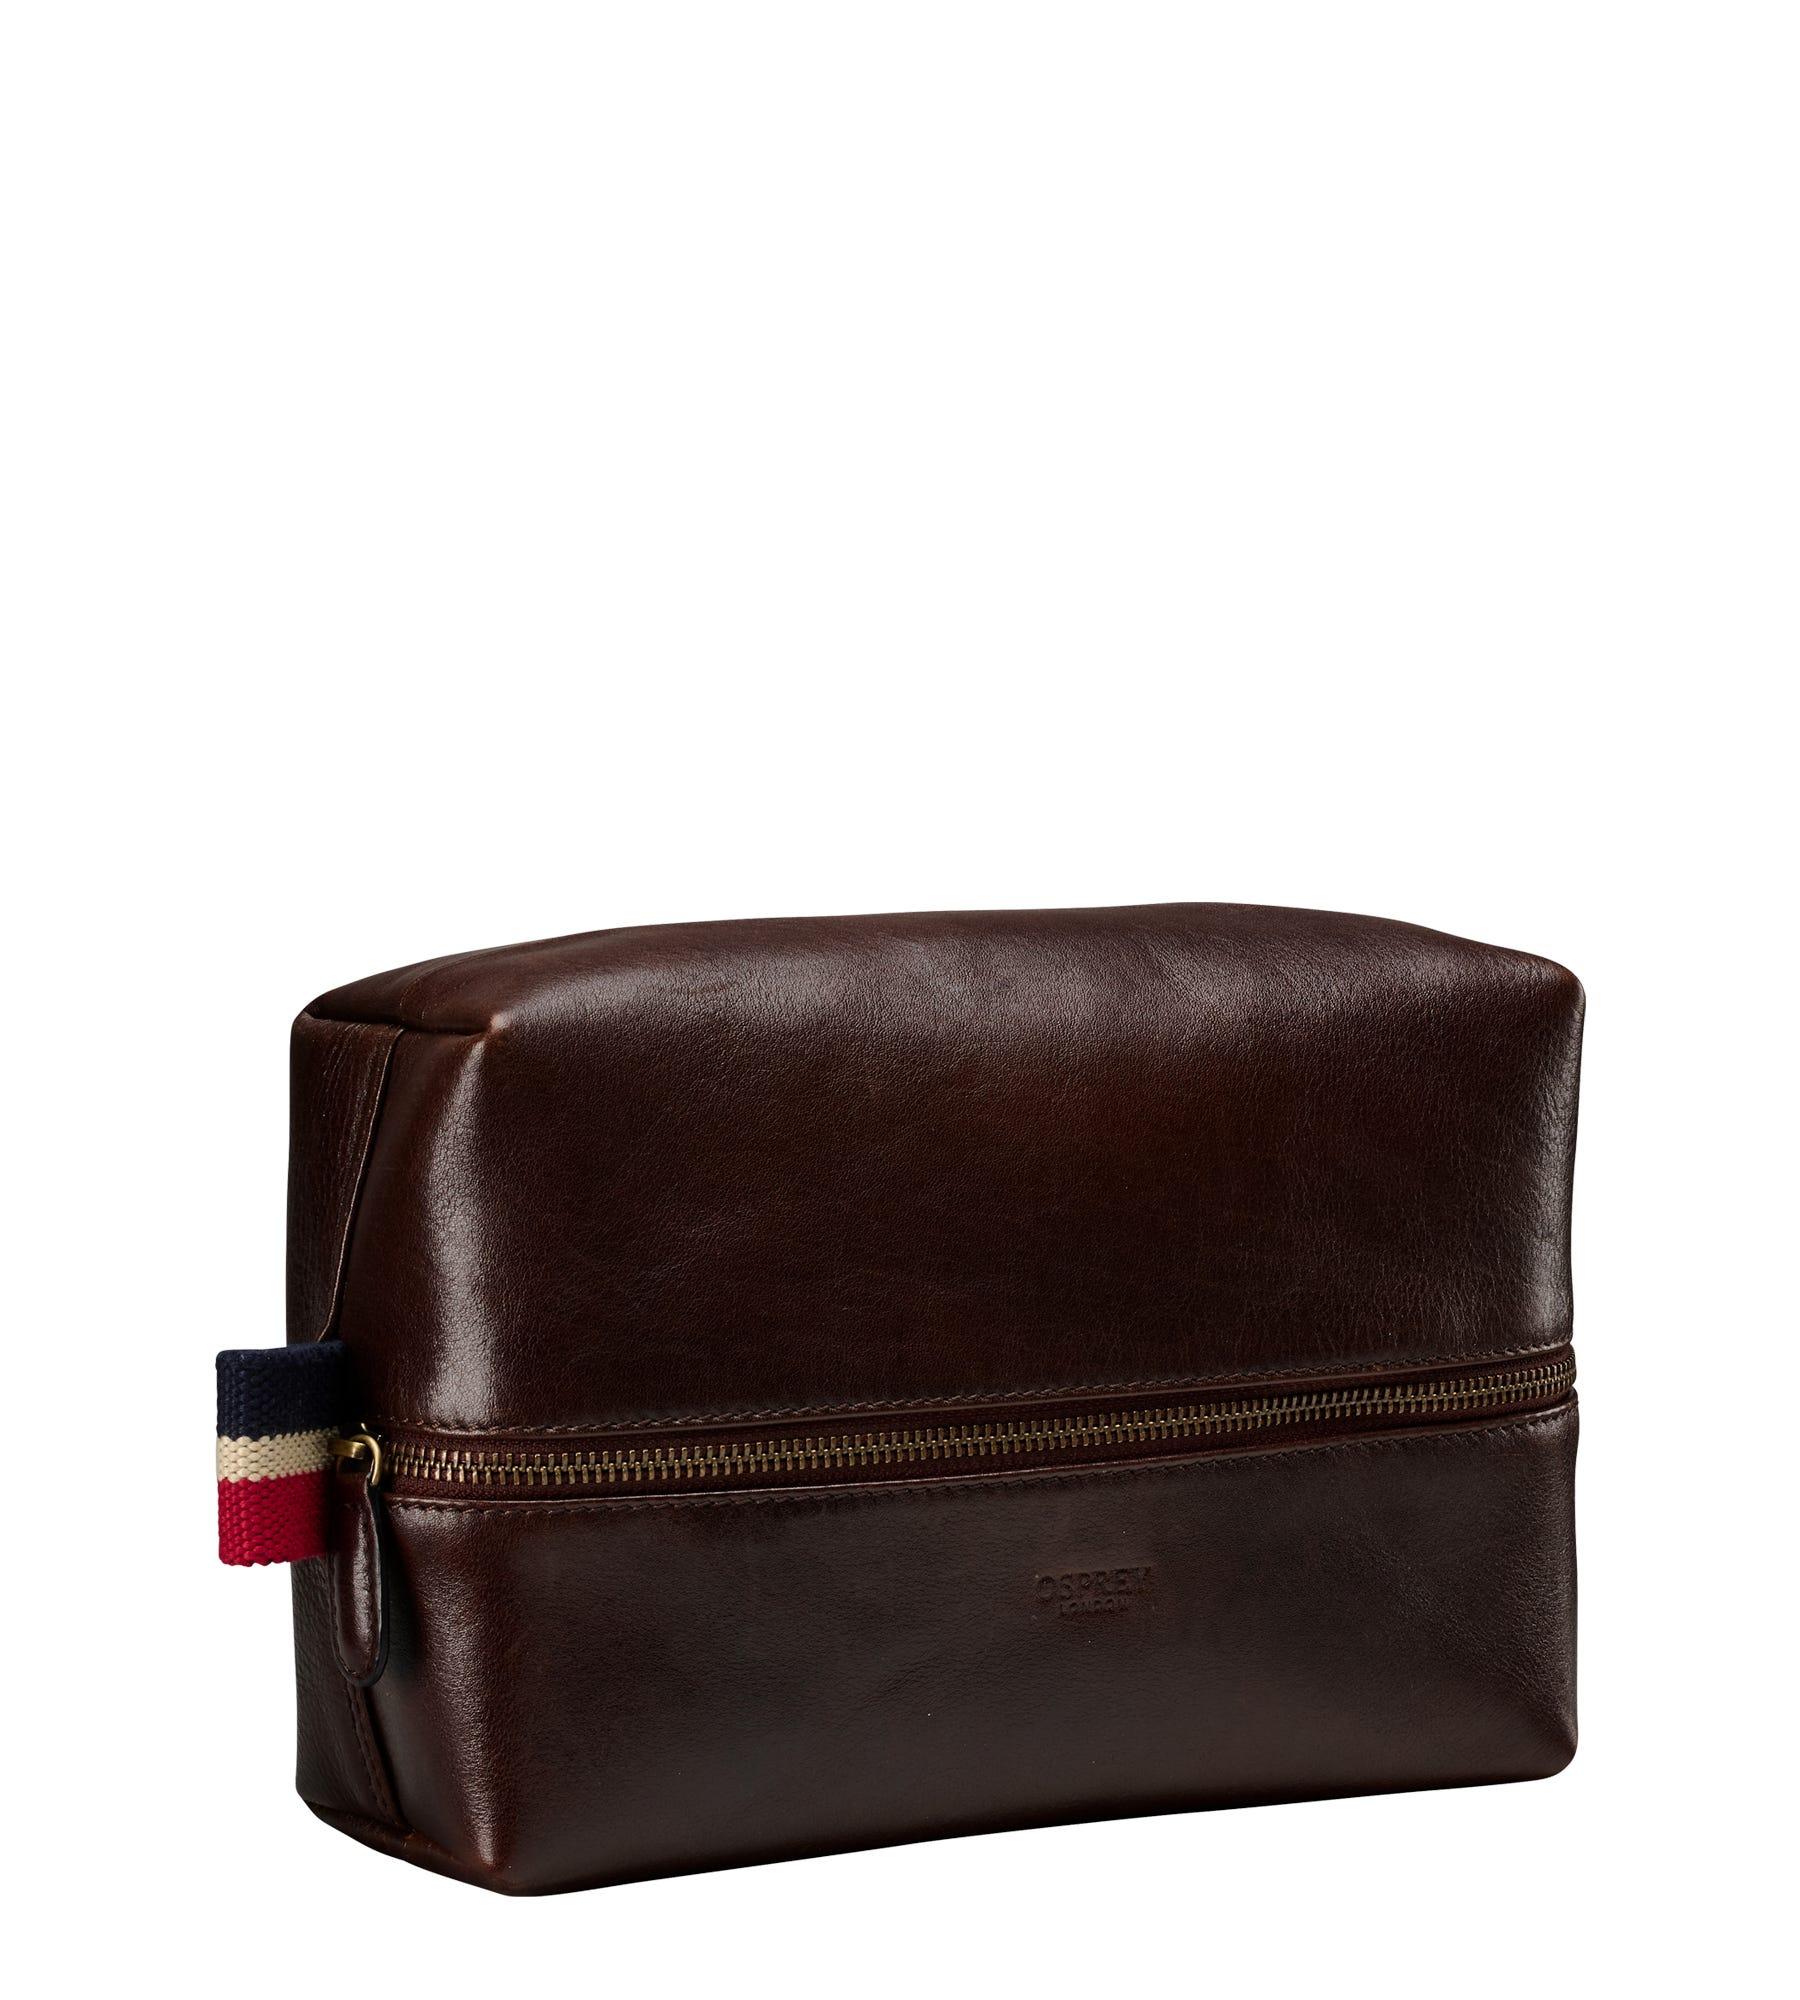 An image of The Malham Leather Washbag